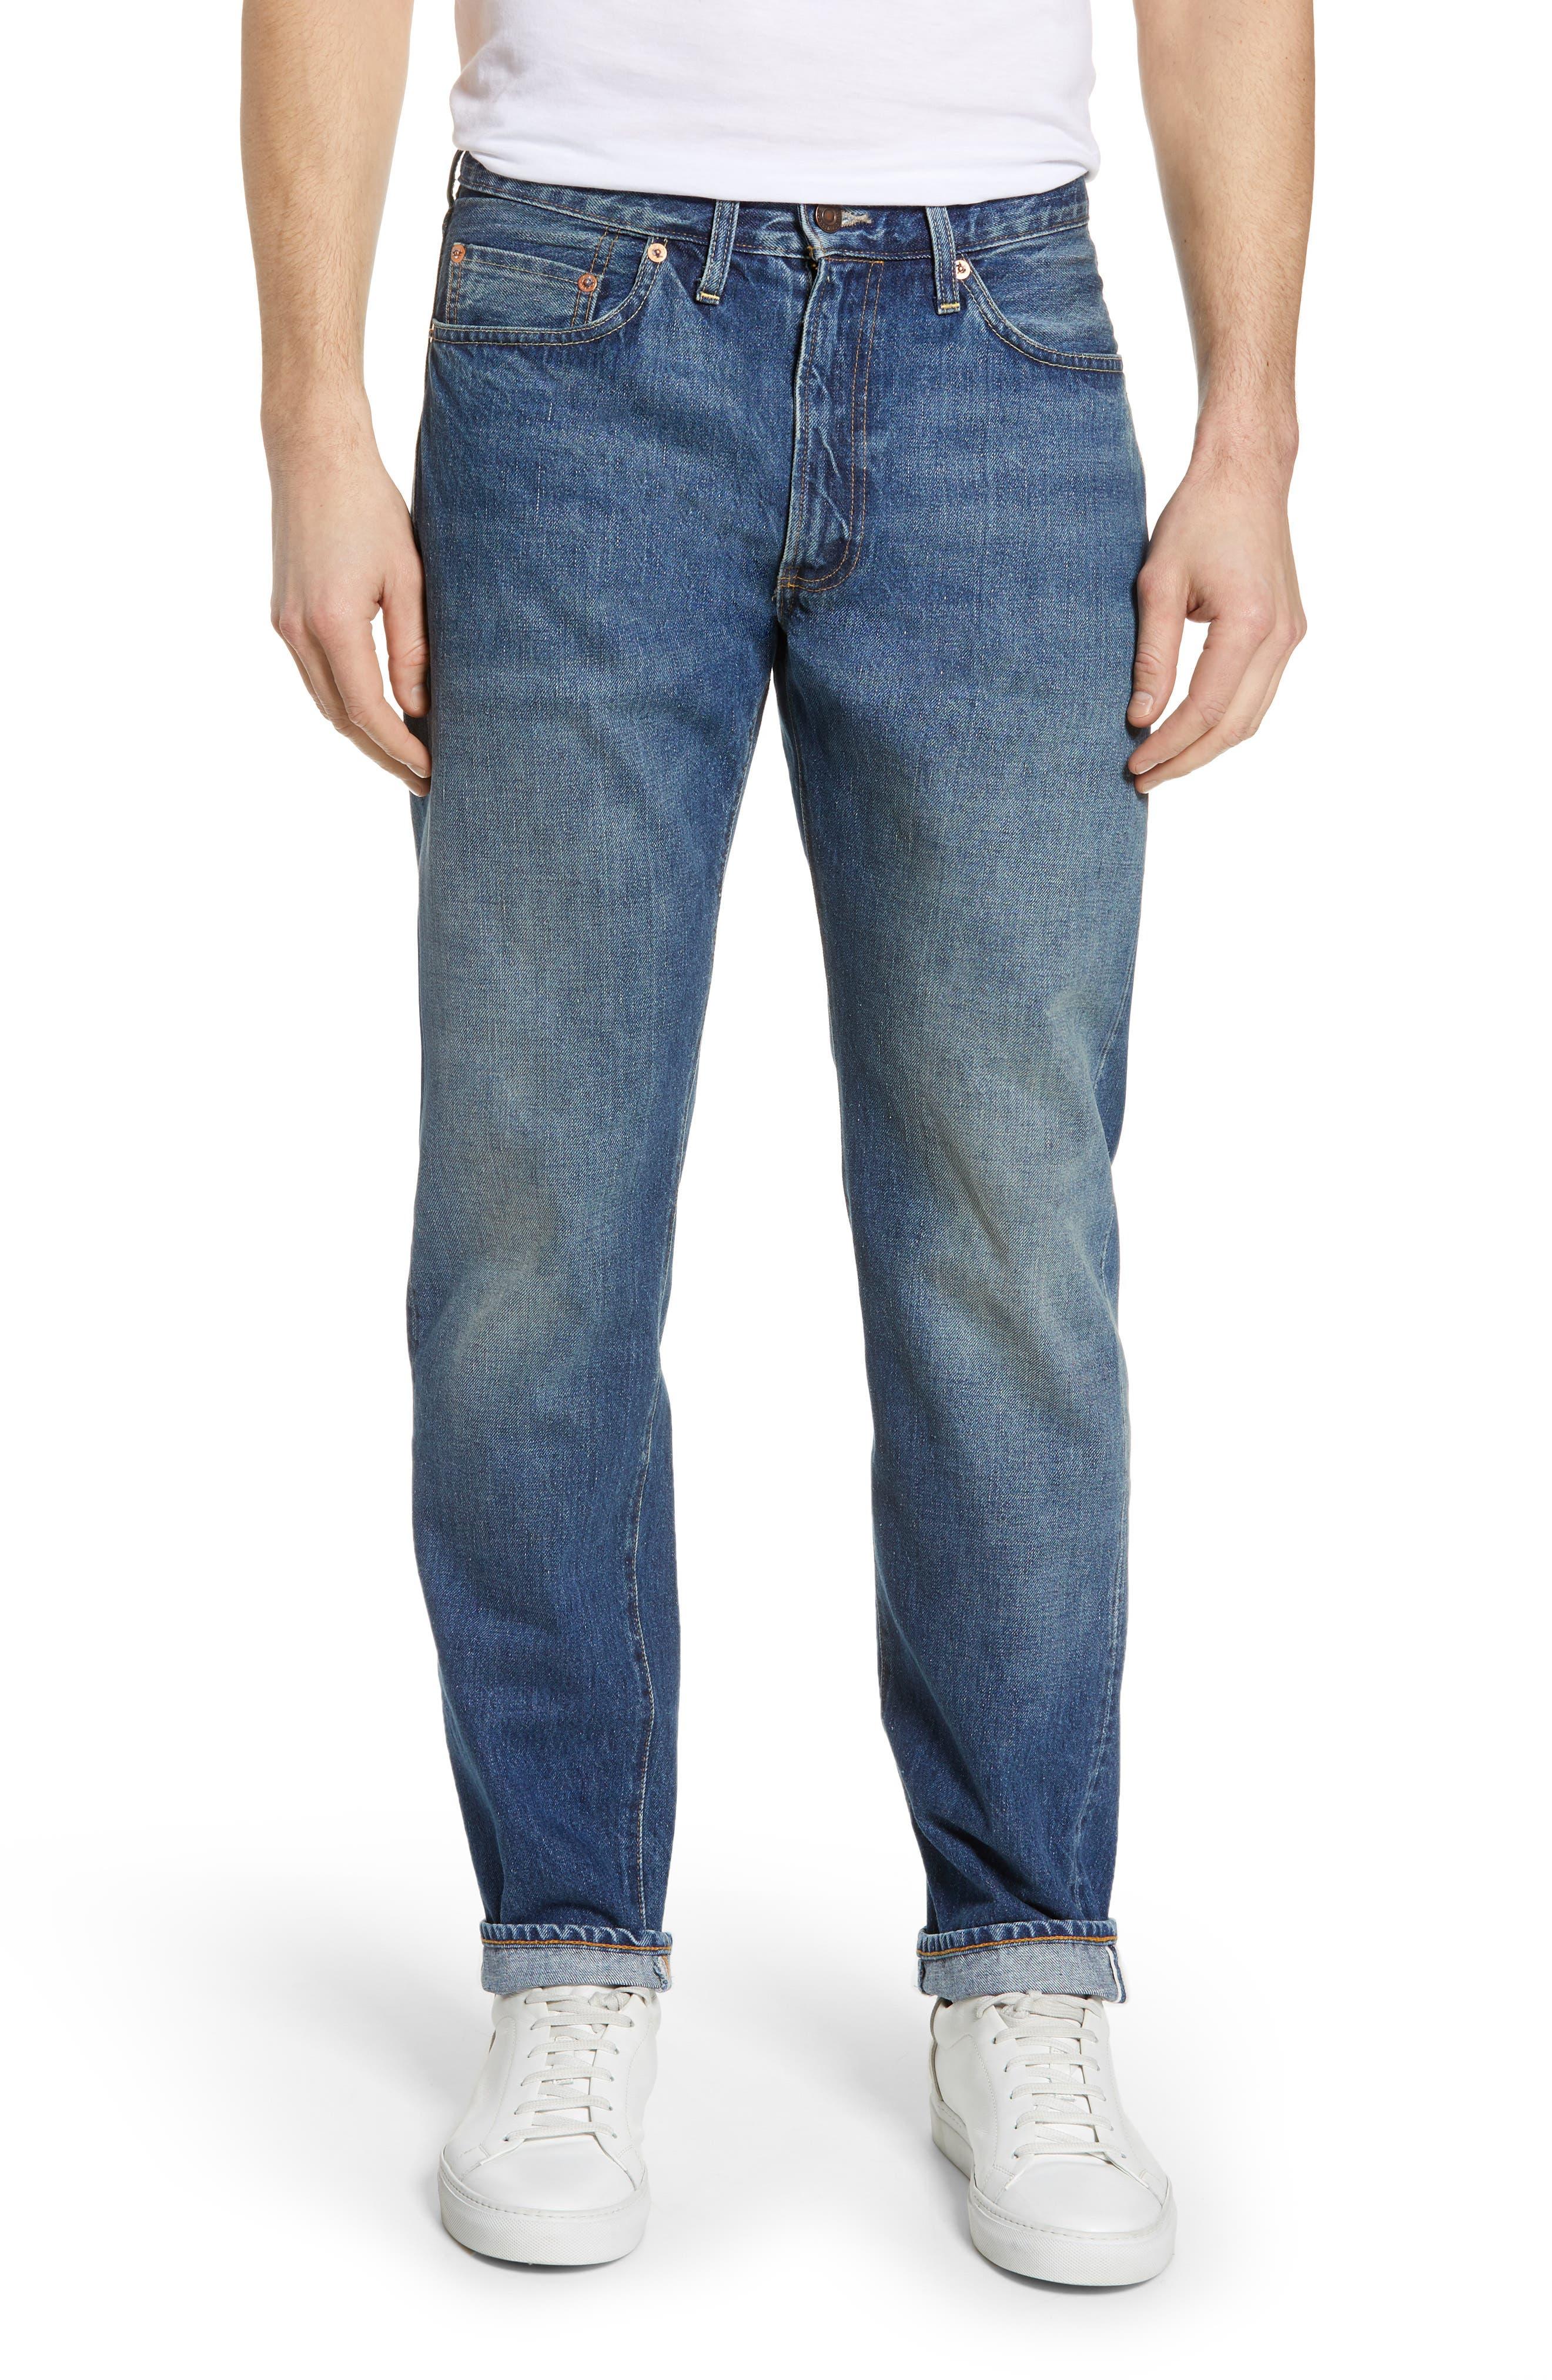 LEVI'S<SUP>®</SUP> VINTAGE CLOTHING, 1954 501<sup>®</sup> Straight Leg Jeans, Main thumbnail 1, color, PINWHEEL